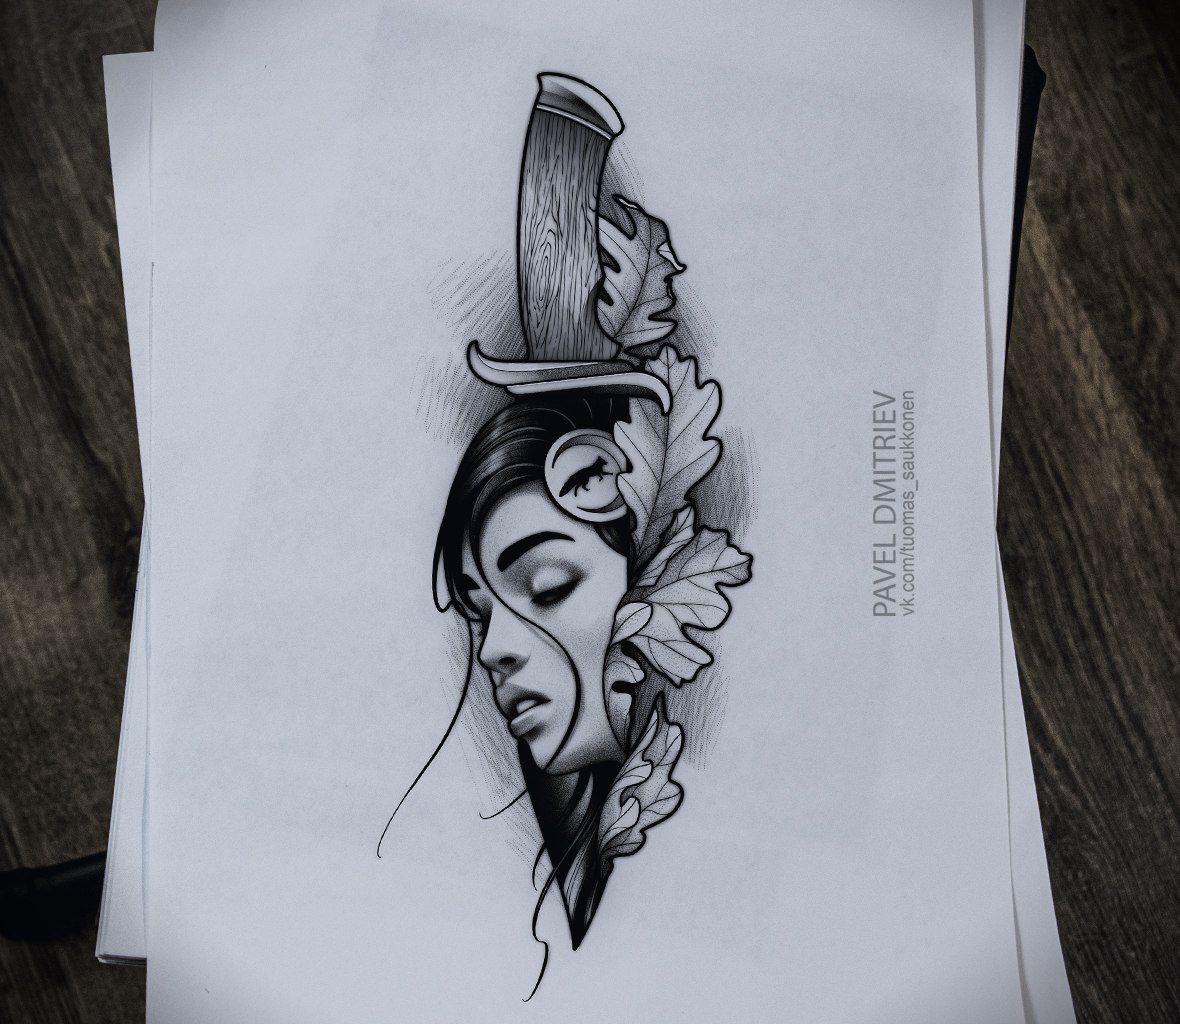 Https I Pinimg Com 564x 0c B7 9c 0cb79c71b467d3fcafc9ba22b5655727 Jpg Wolf Tattoo Design Tattoo Designs Wolf Tattoos